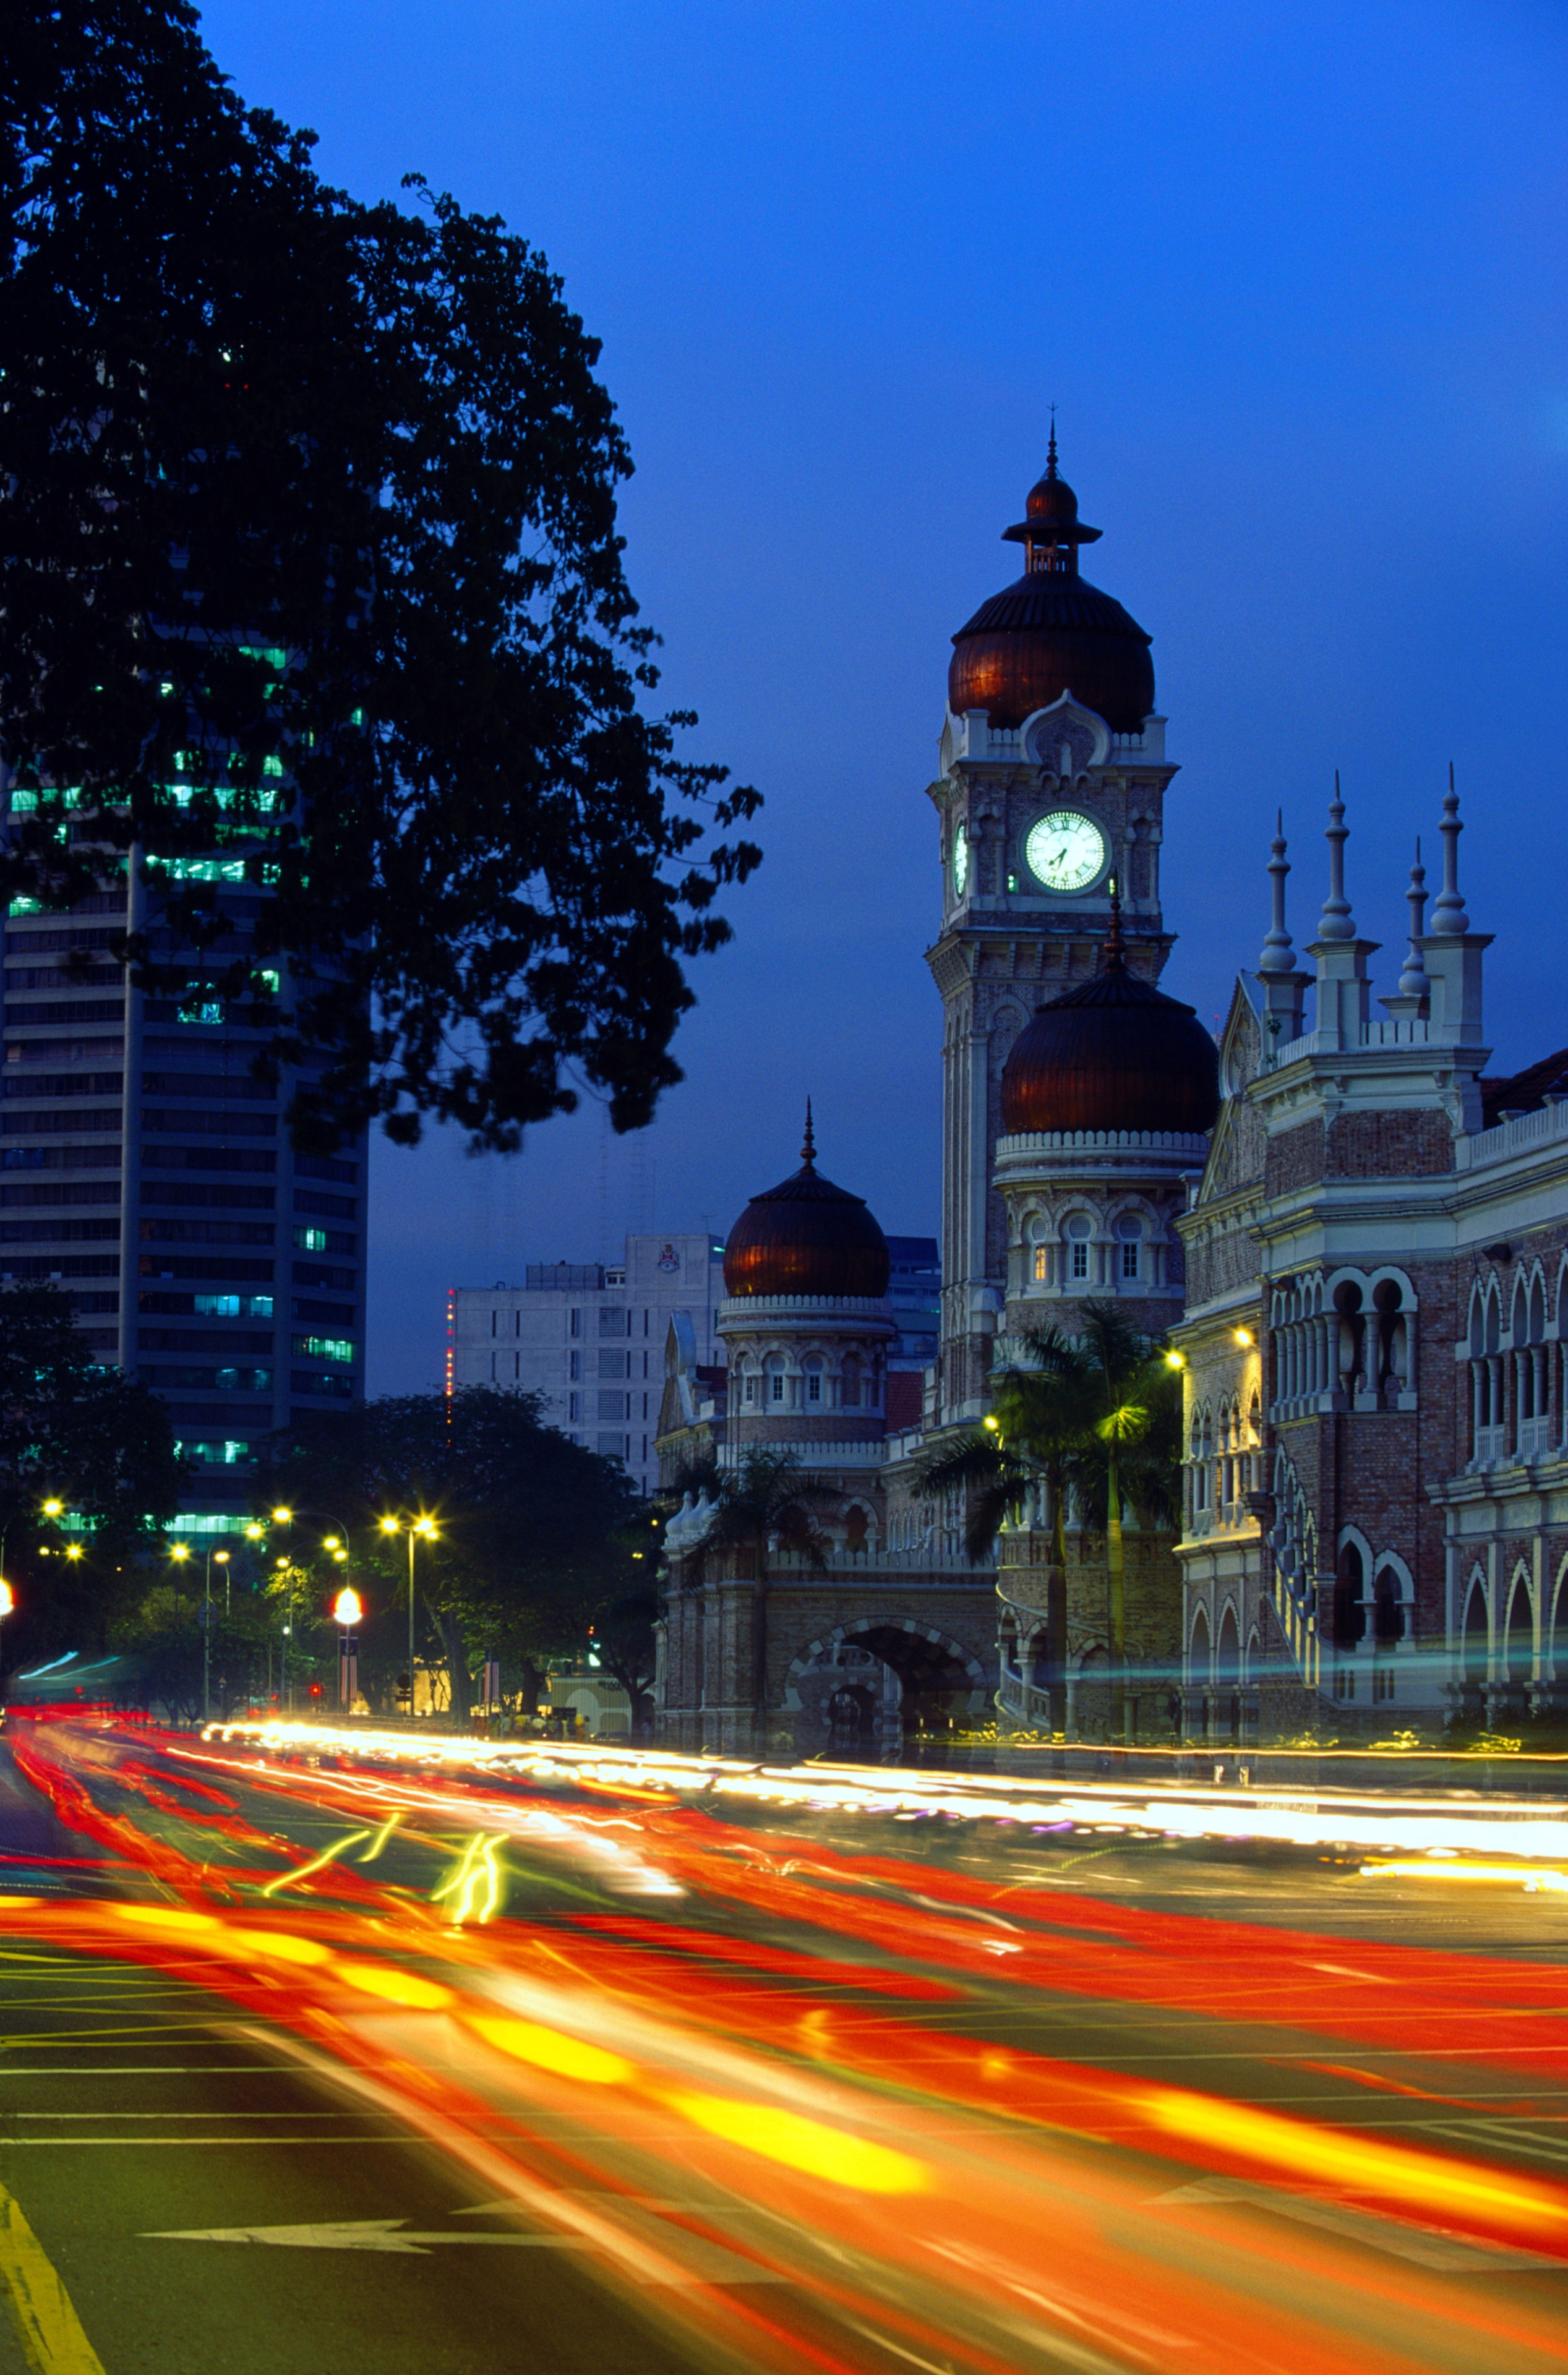 Kuala Langat District, Selangor, Malaysia